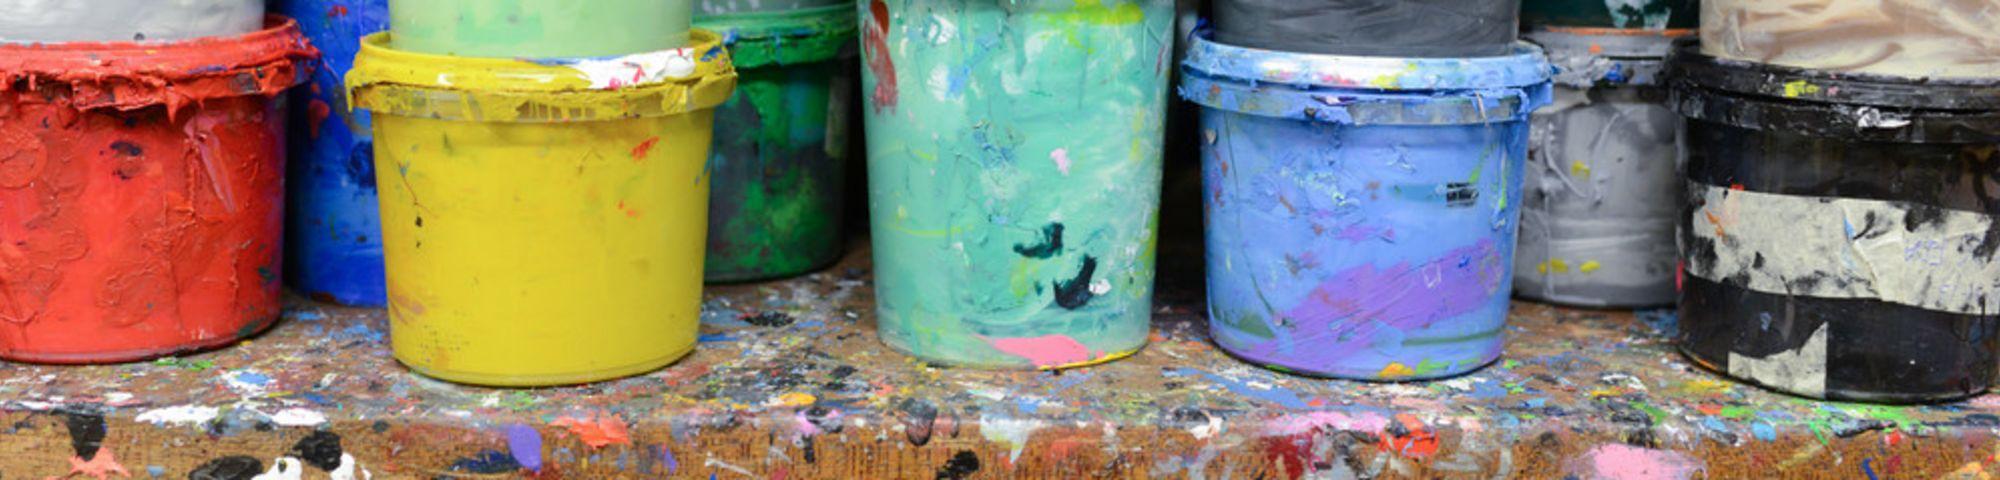 Paint pots on a shelf